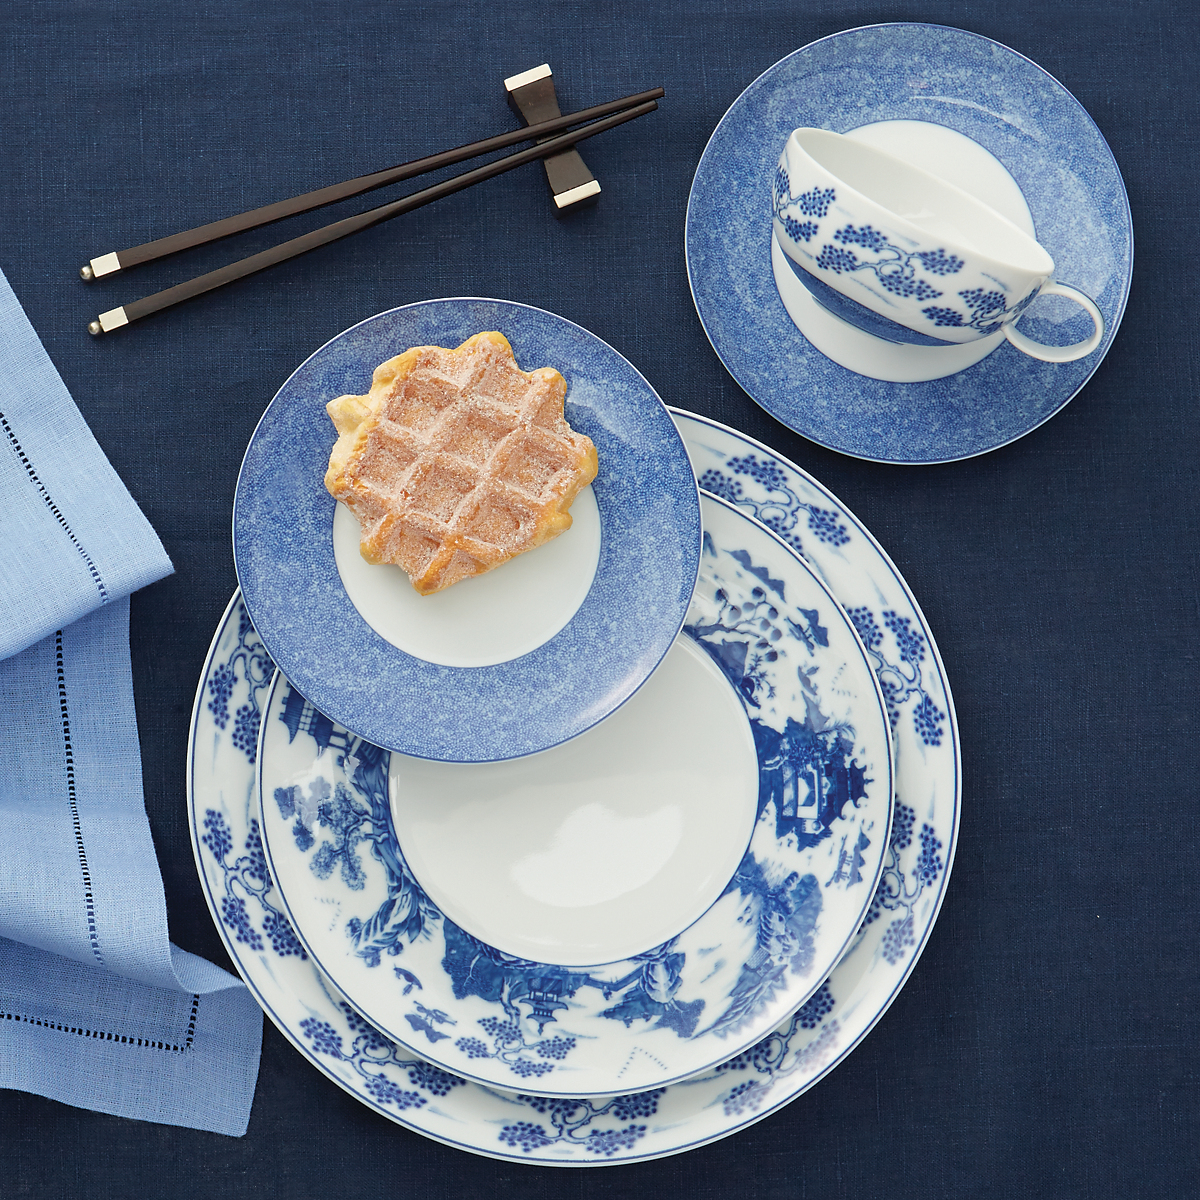 Mottahedeh Blue Shou Dinnerware & Mottahedeh Blue Shou Dinnerware | Gump\u0027s